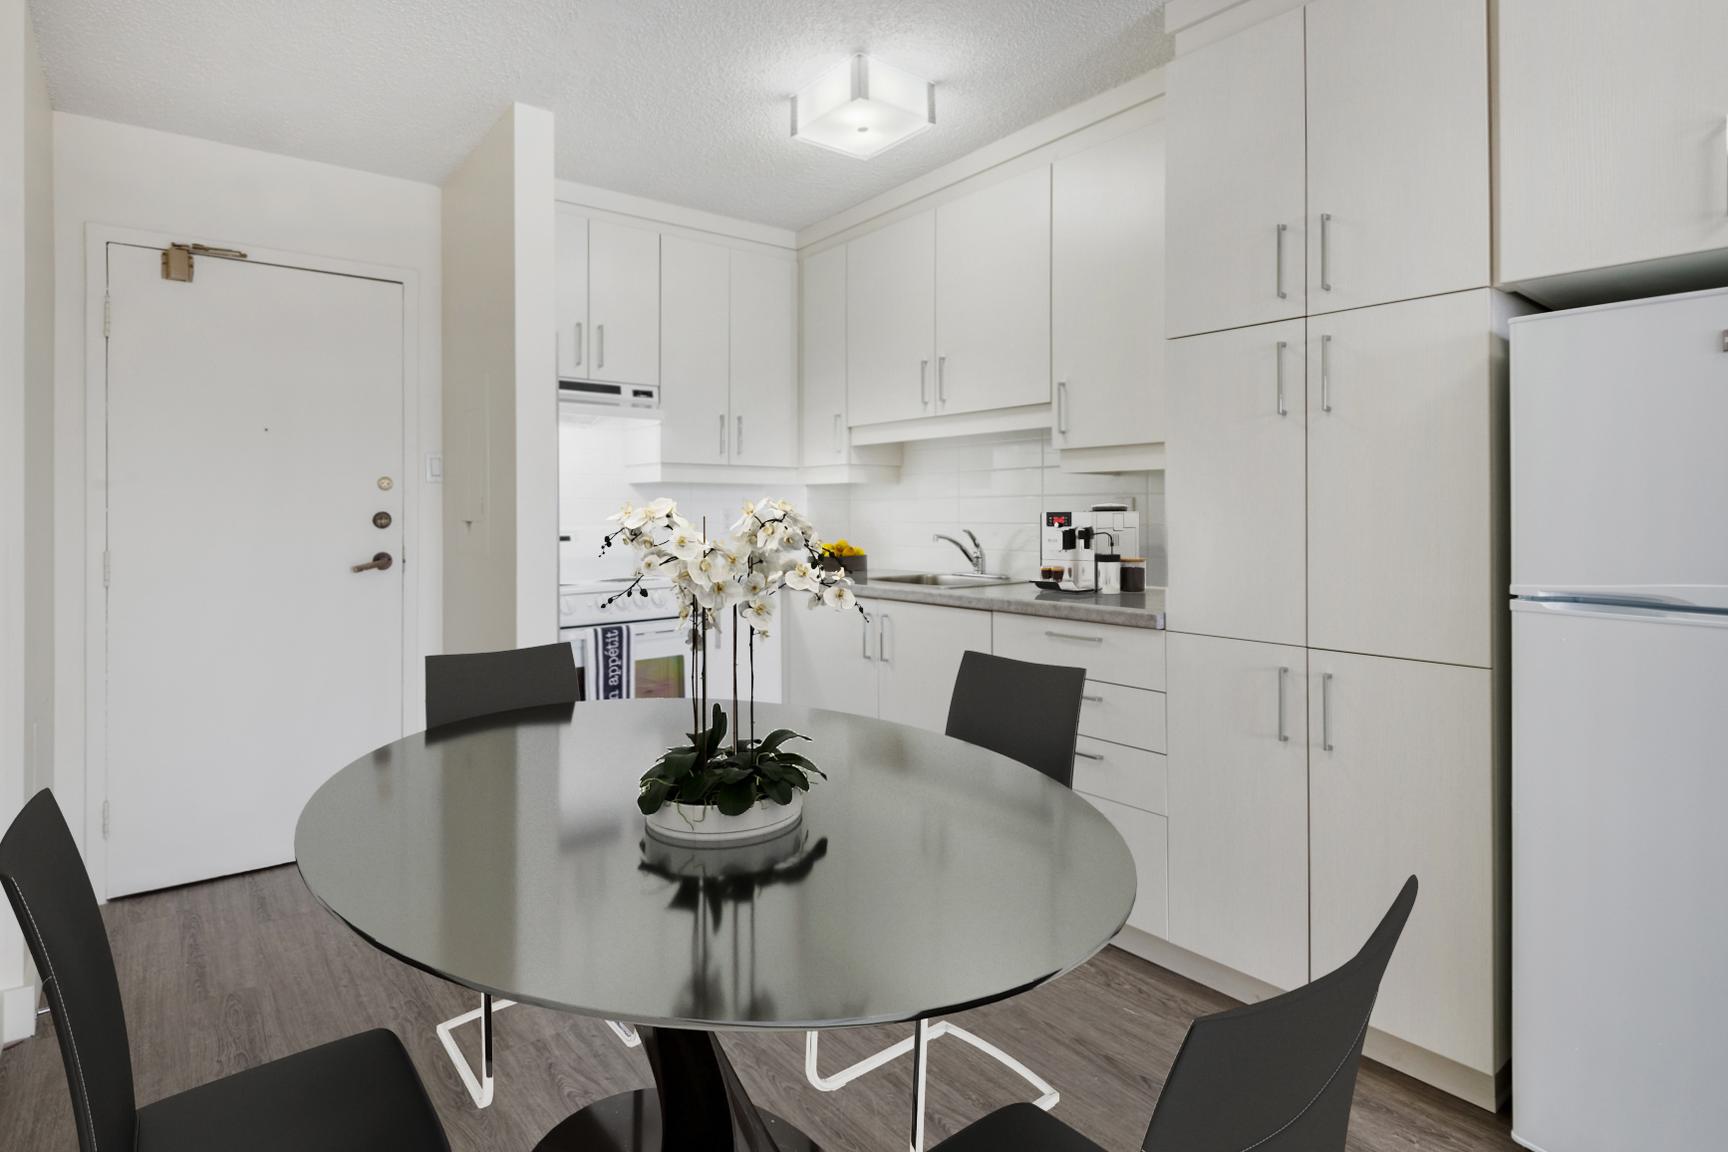 1 bedroom Apartments for rent in Laval at Le Quatre Cent - Photo 12 - RentQuebecApartments – L407183